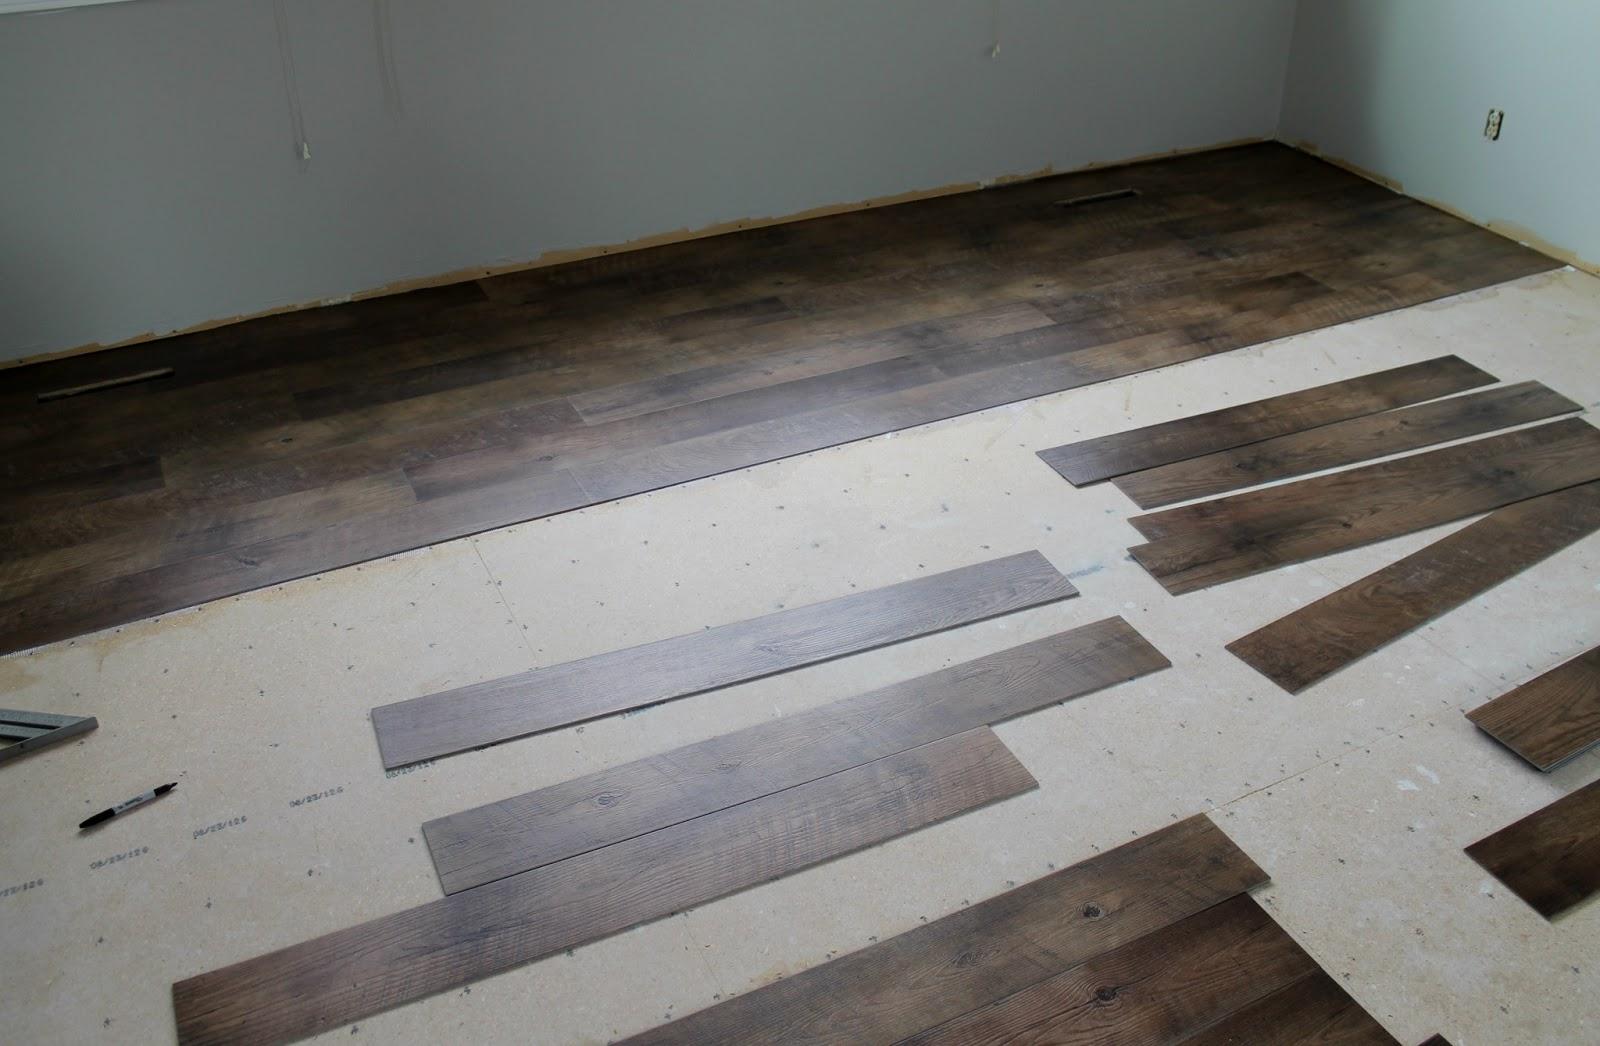 Wooden Wallpaper Textured House Vinyl